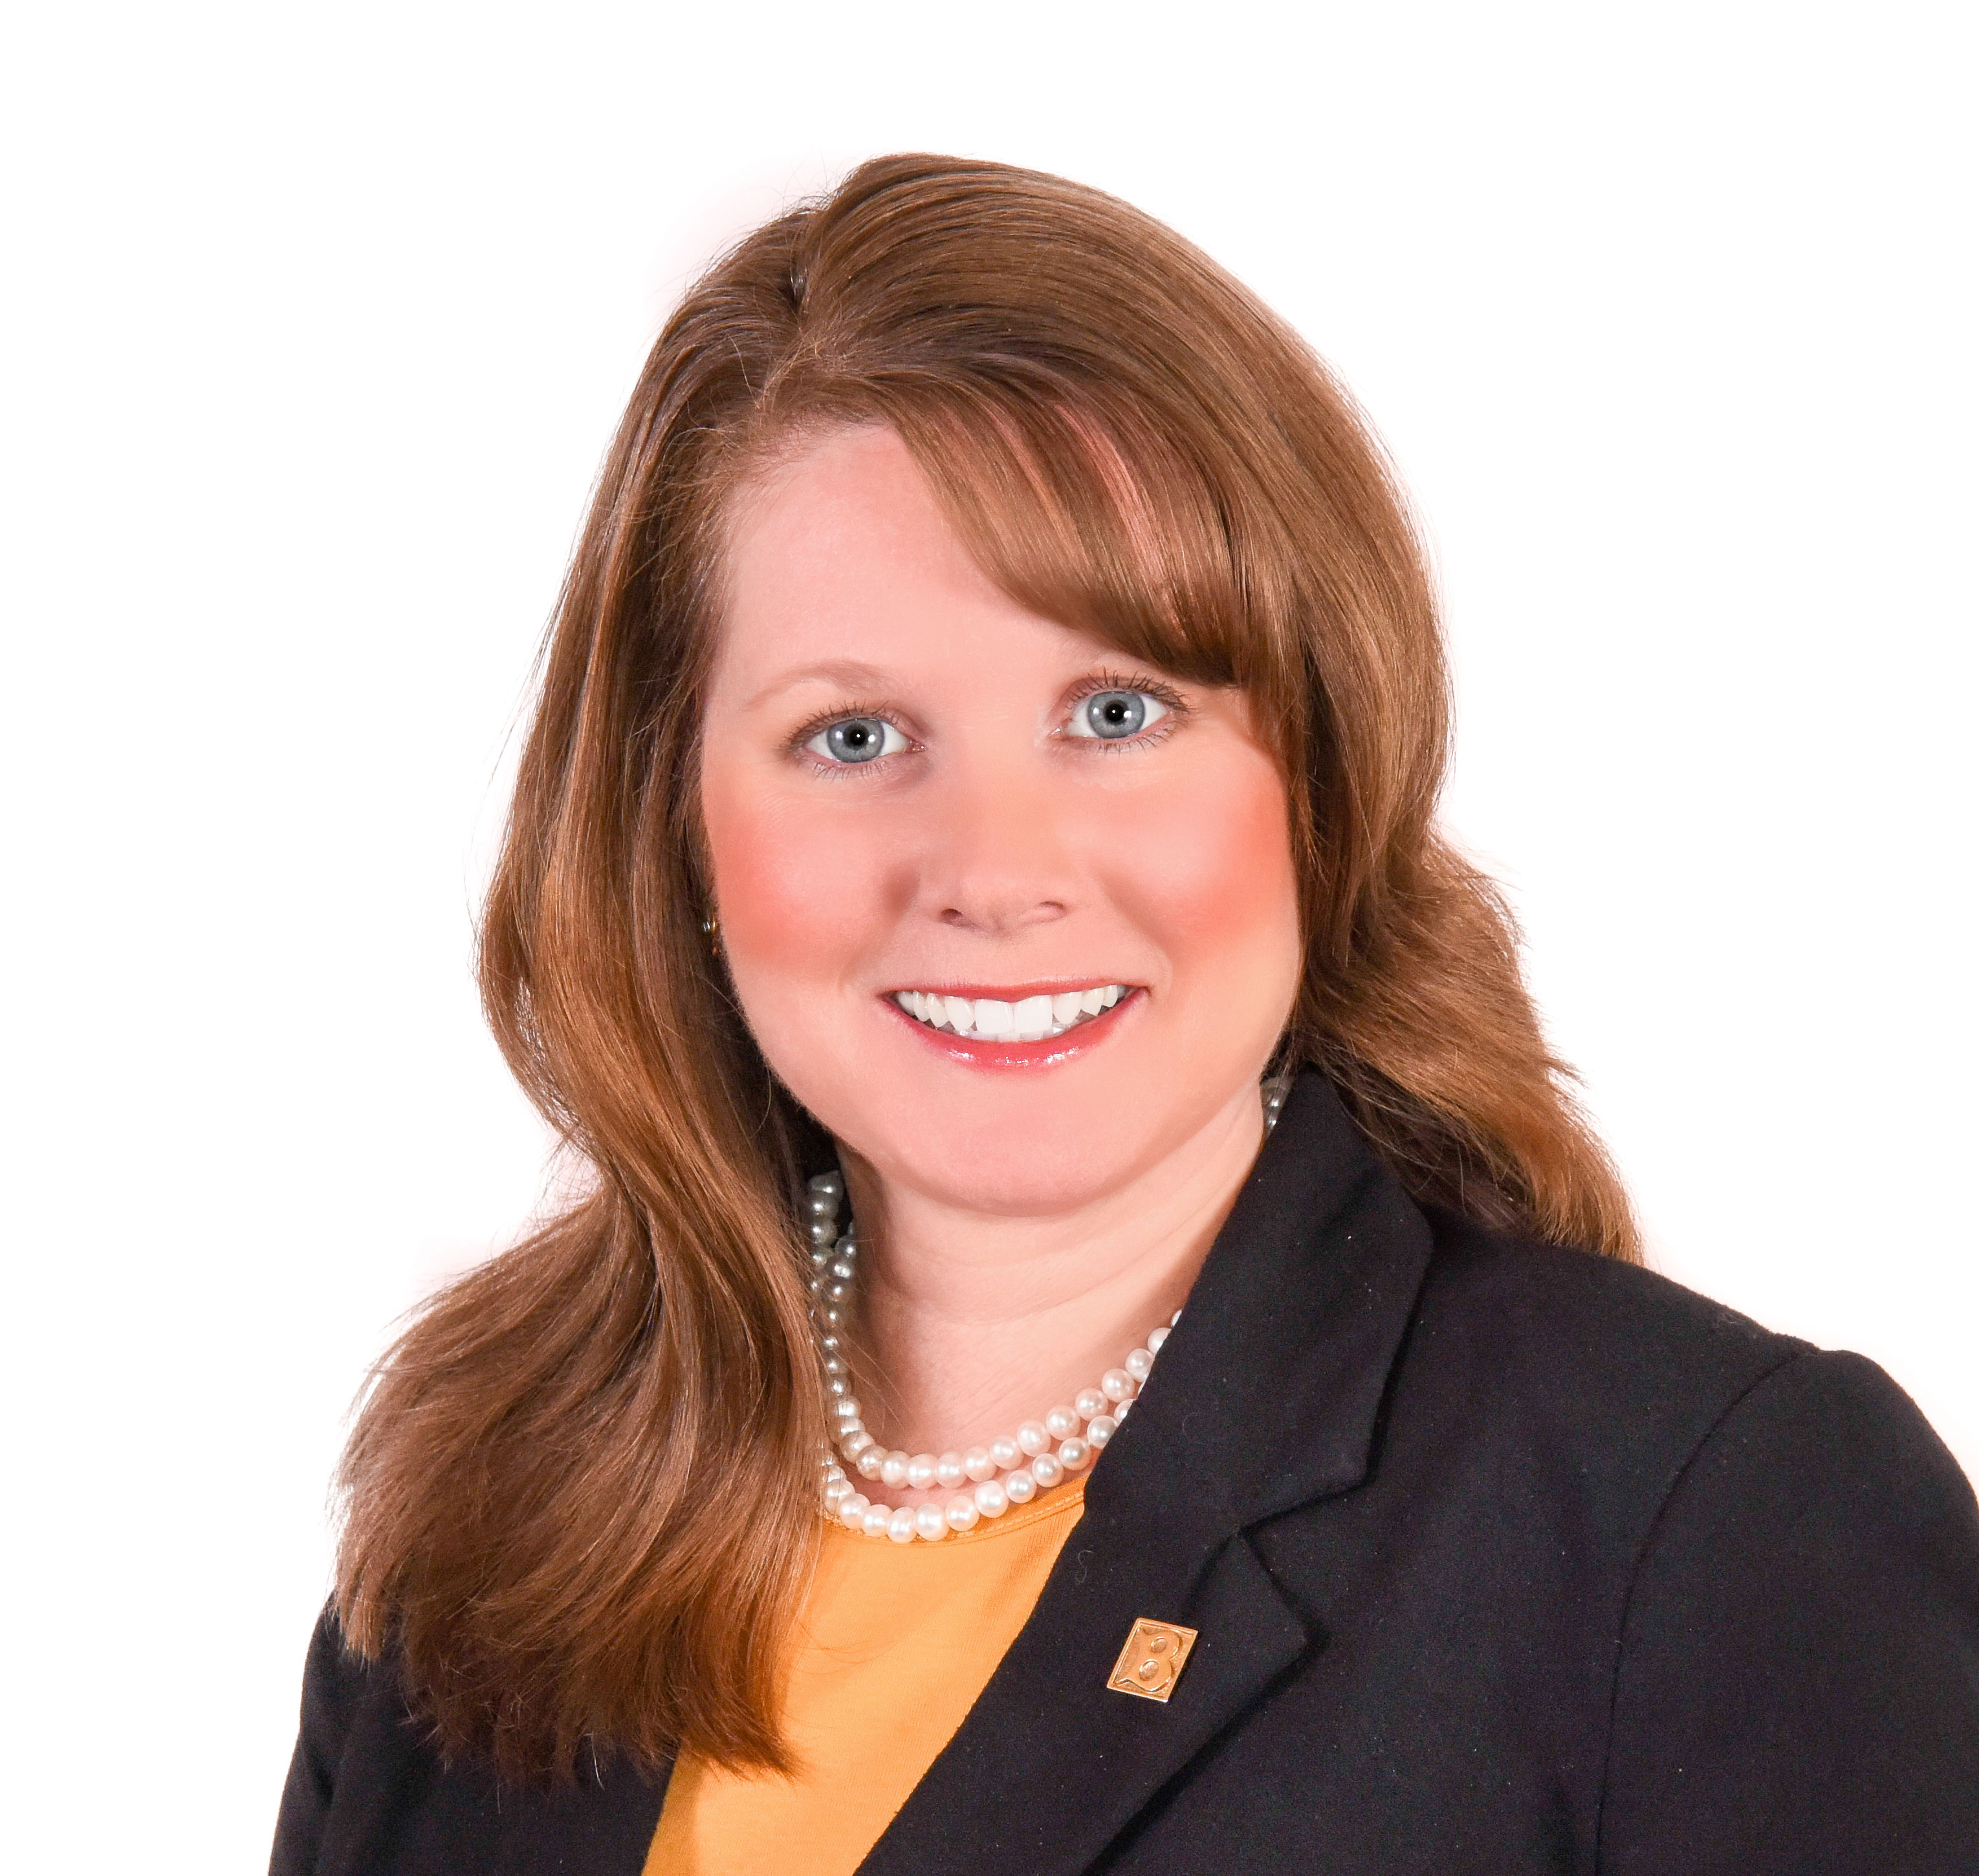 Stefanie Helfer, Funeral Director